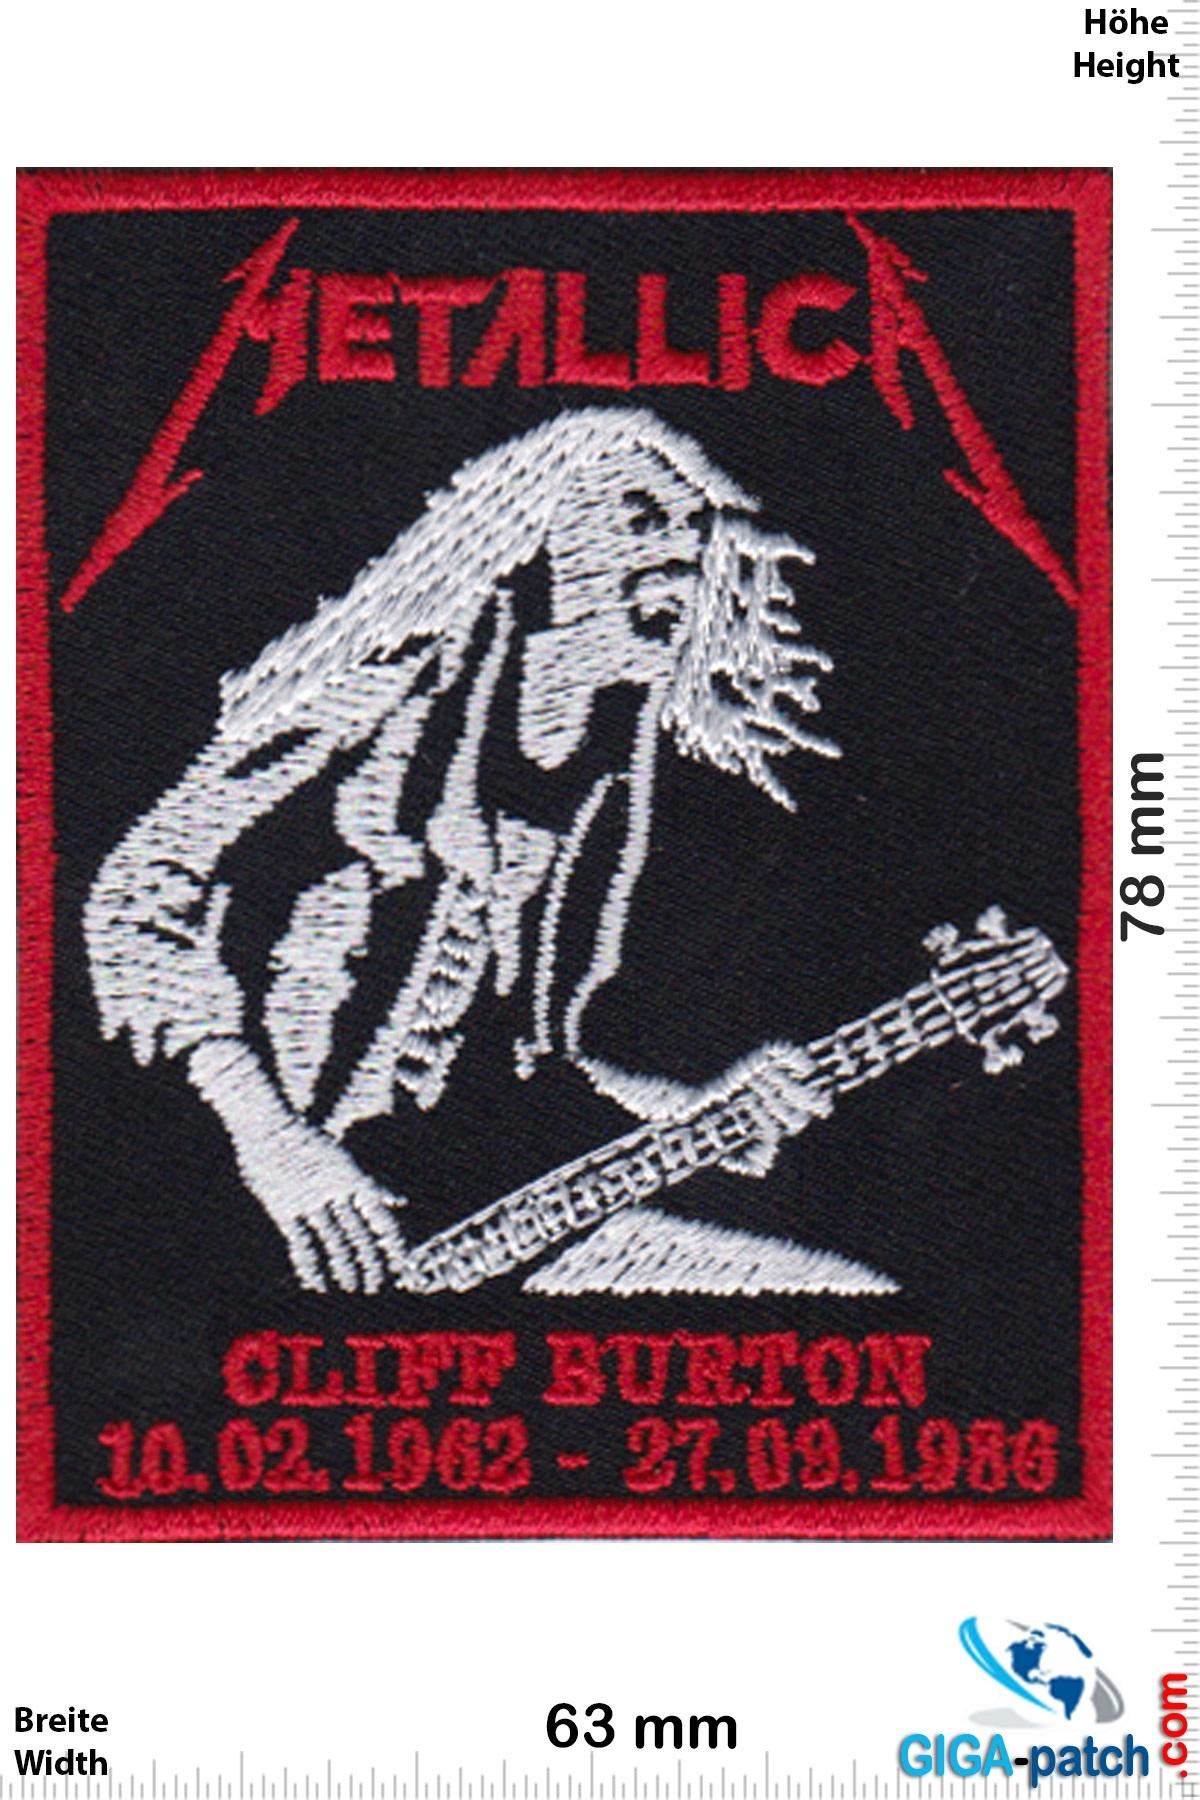 Metallica Metallica - Cliff Burton - 10.02.1962  - - 27.09-1980